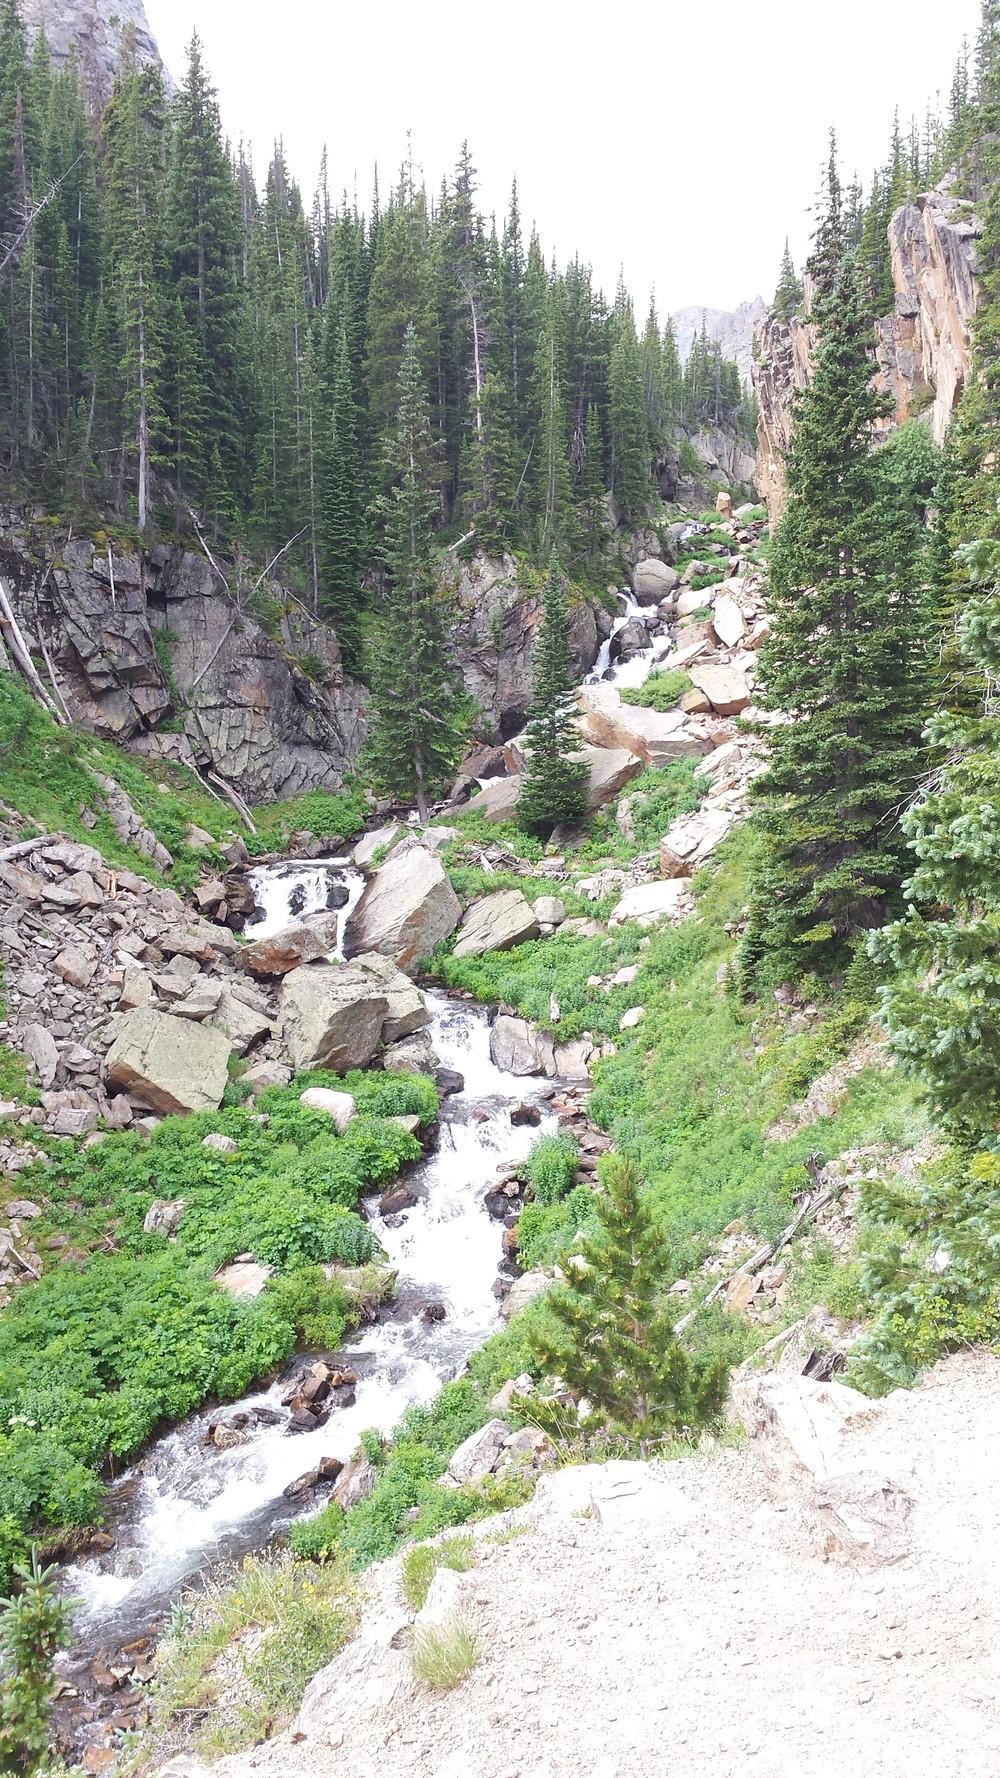 35-sky-pond-timberline-falls-co-rekinspire.jpg